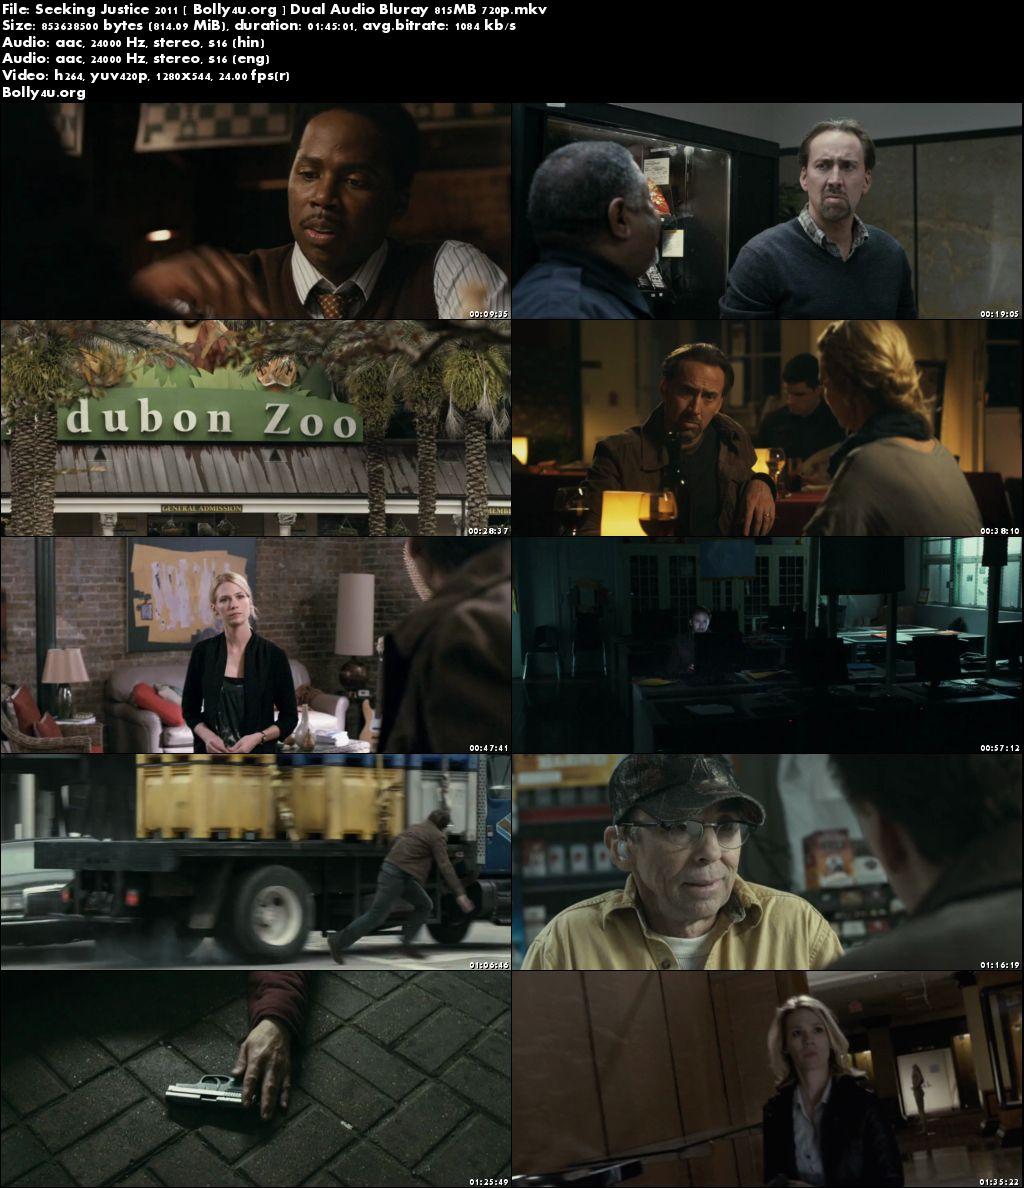 Seeking Justice 2011 BluRay 800MB Hindi Dual Audio 720p Download